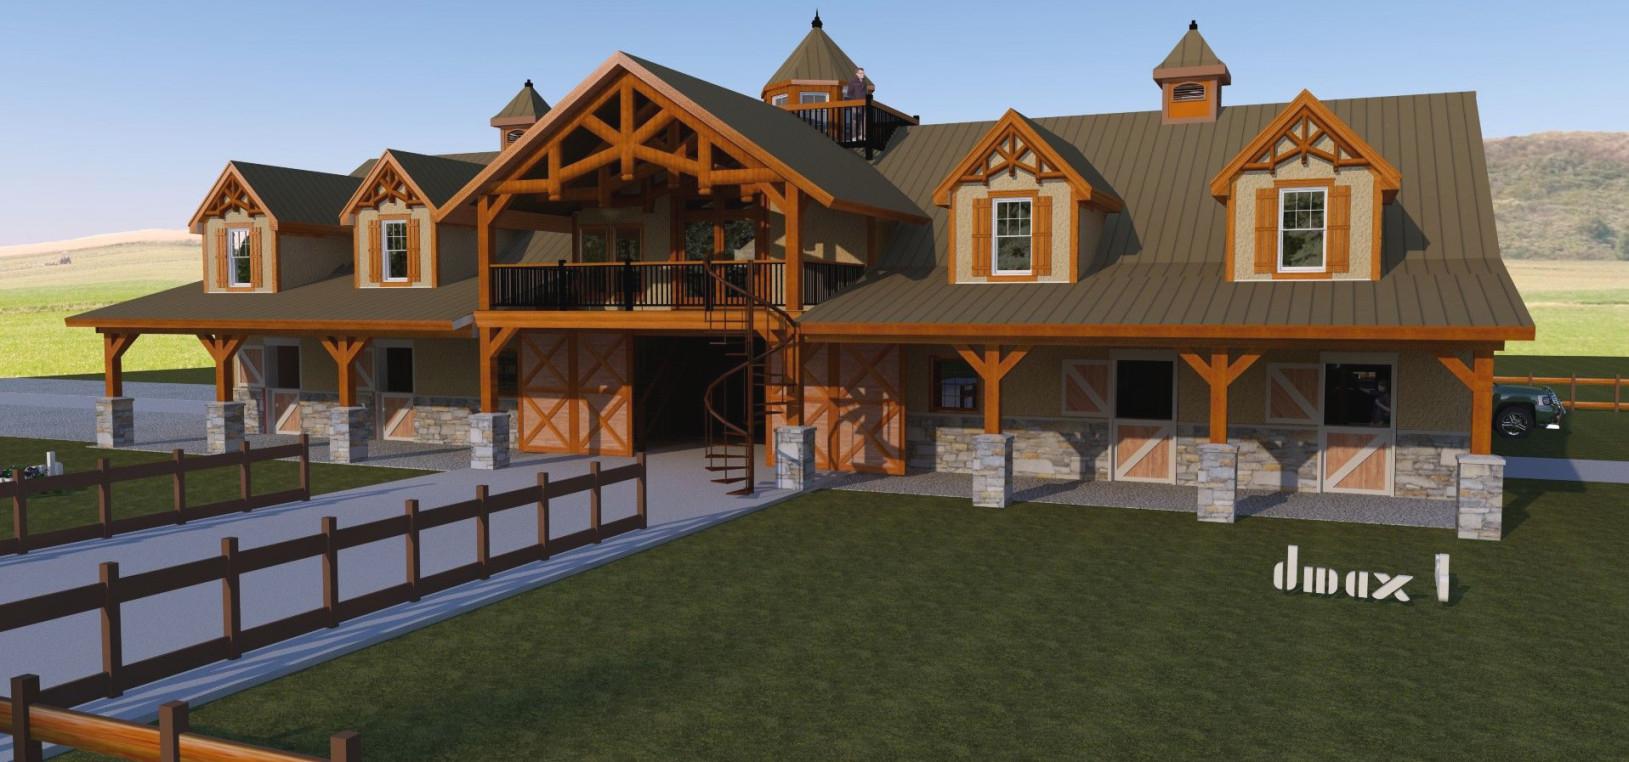 6 Stall, Tack, Wash, 3 Bedroom Horse Barn W/ Living Quarters with Horse Barns With Living Quarters